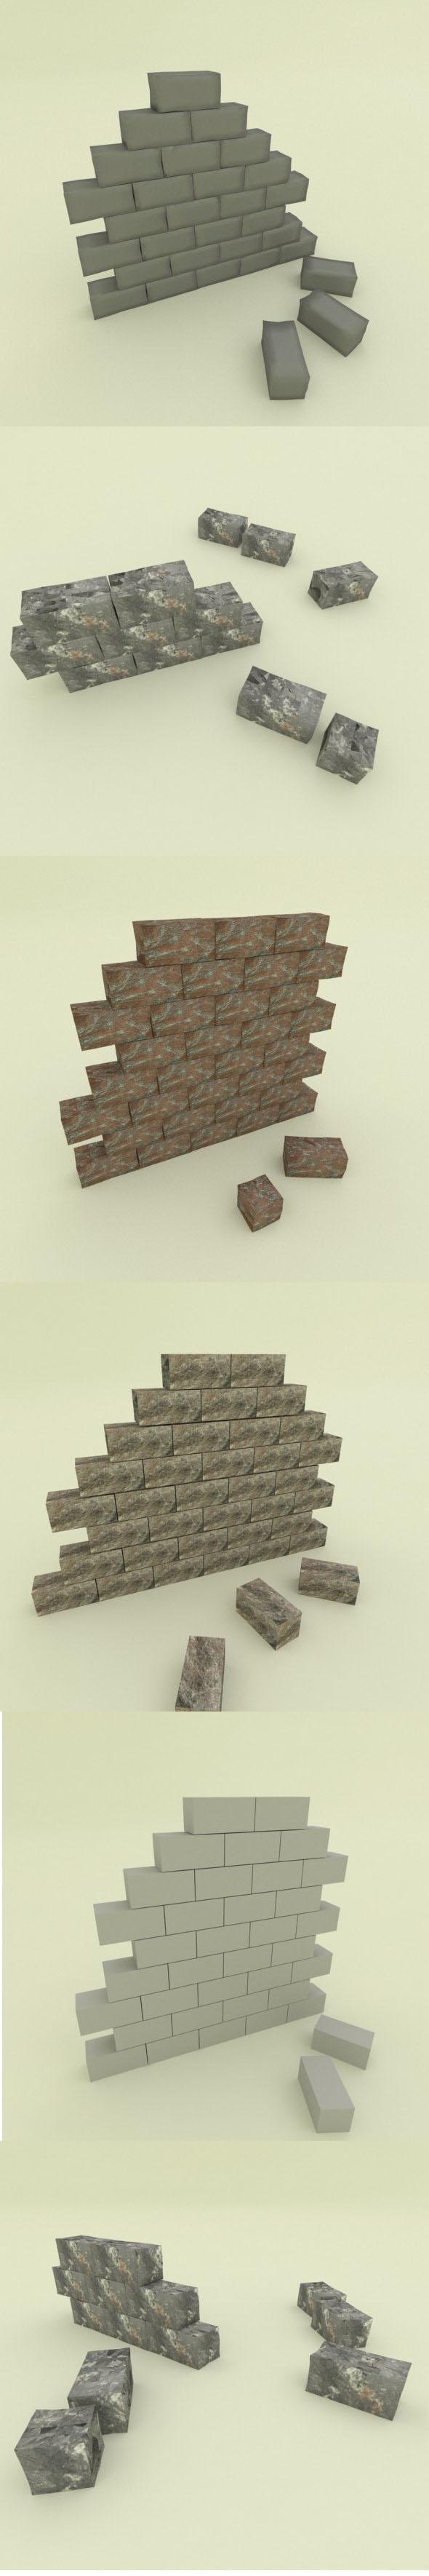 5 stone wall segments